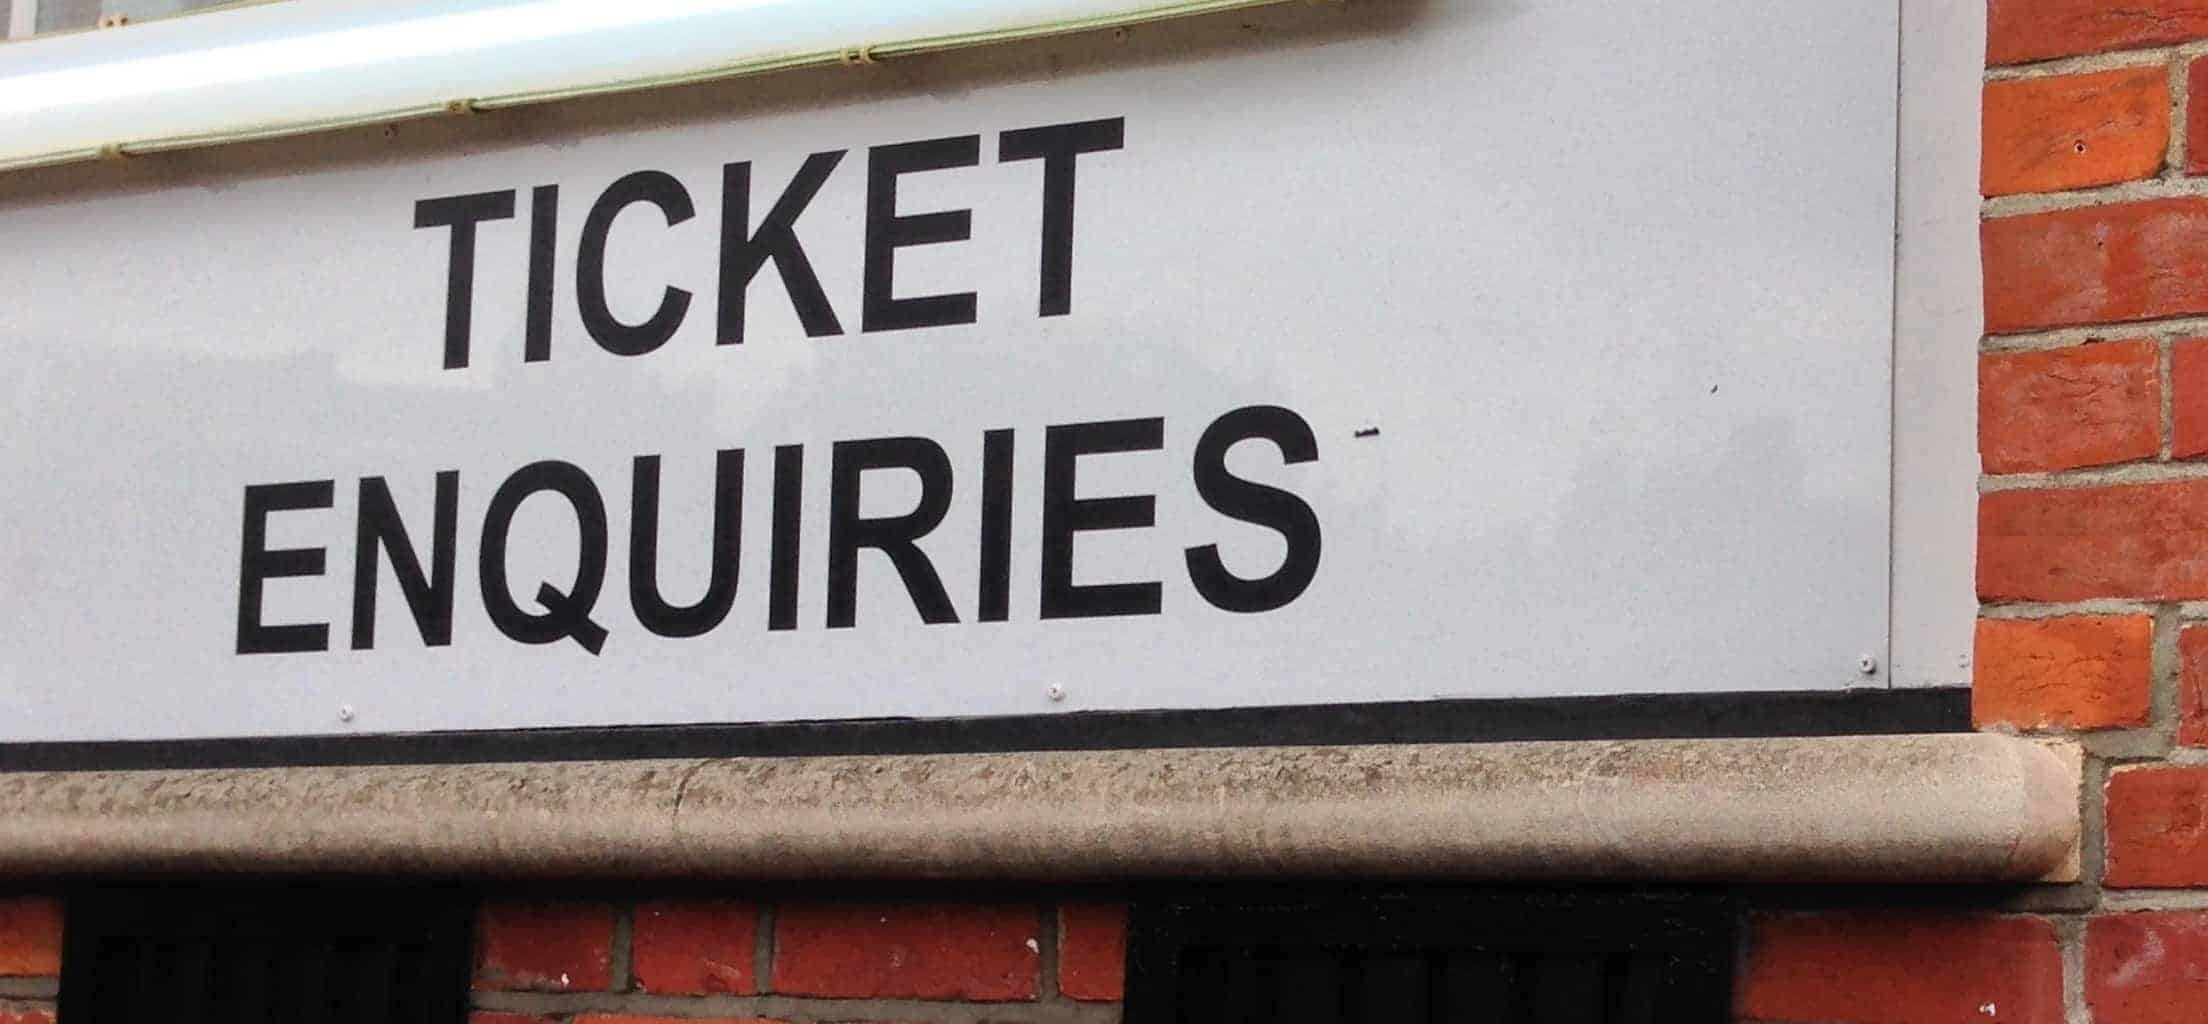 ticket enquiries sign at english football stadium